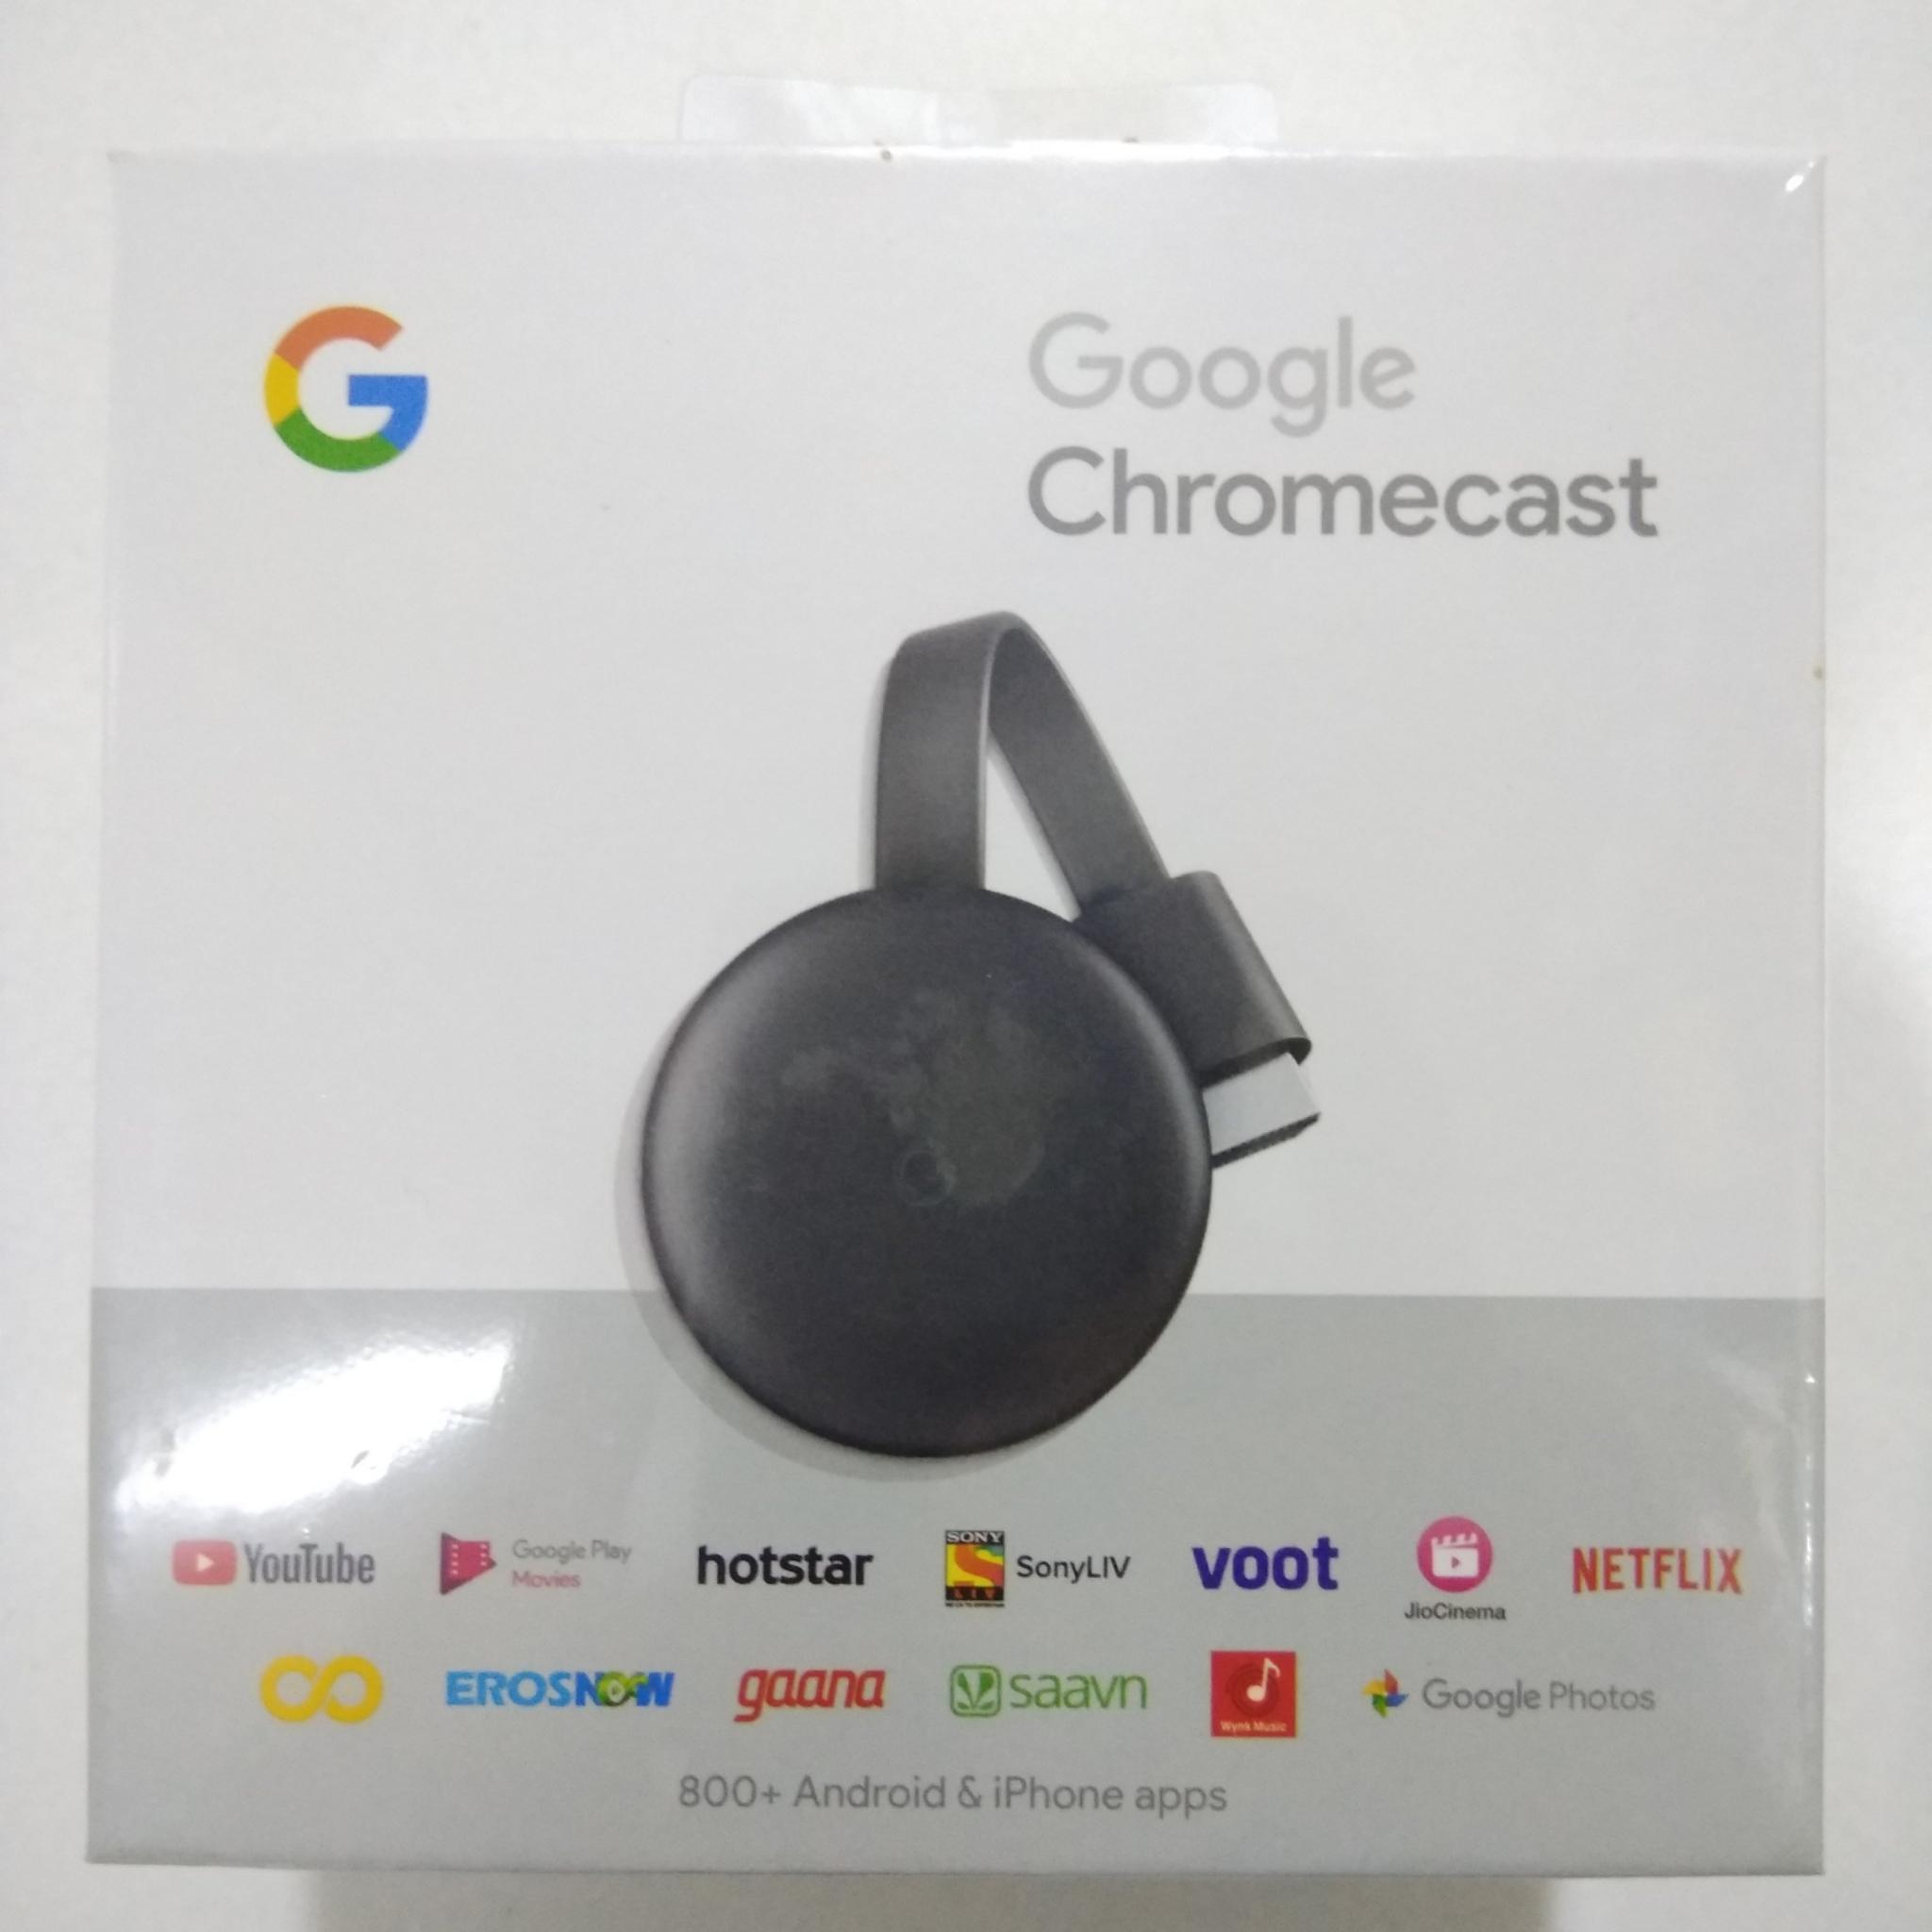 Google Chromecast-3rd Generation Media Player Chromecast-3rd HSN:85176290